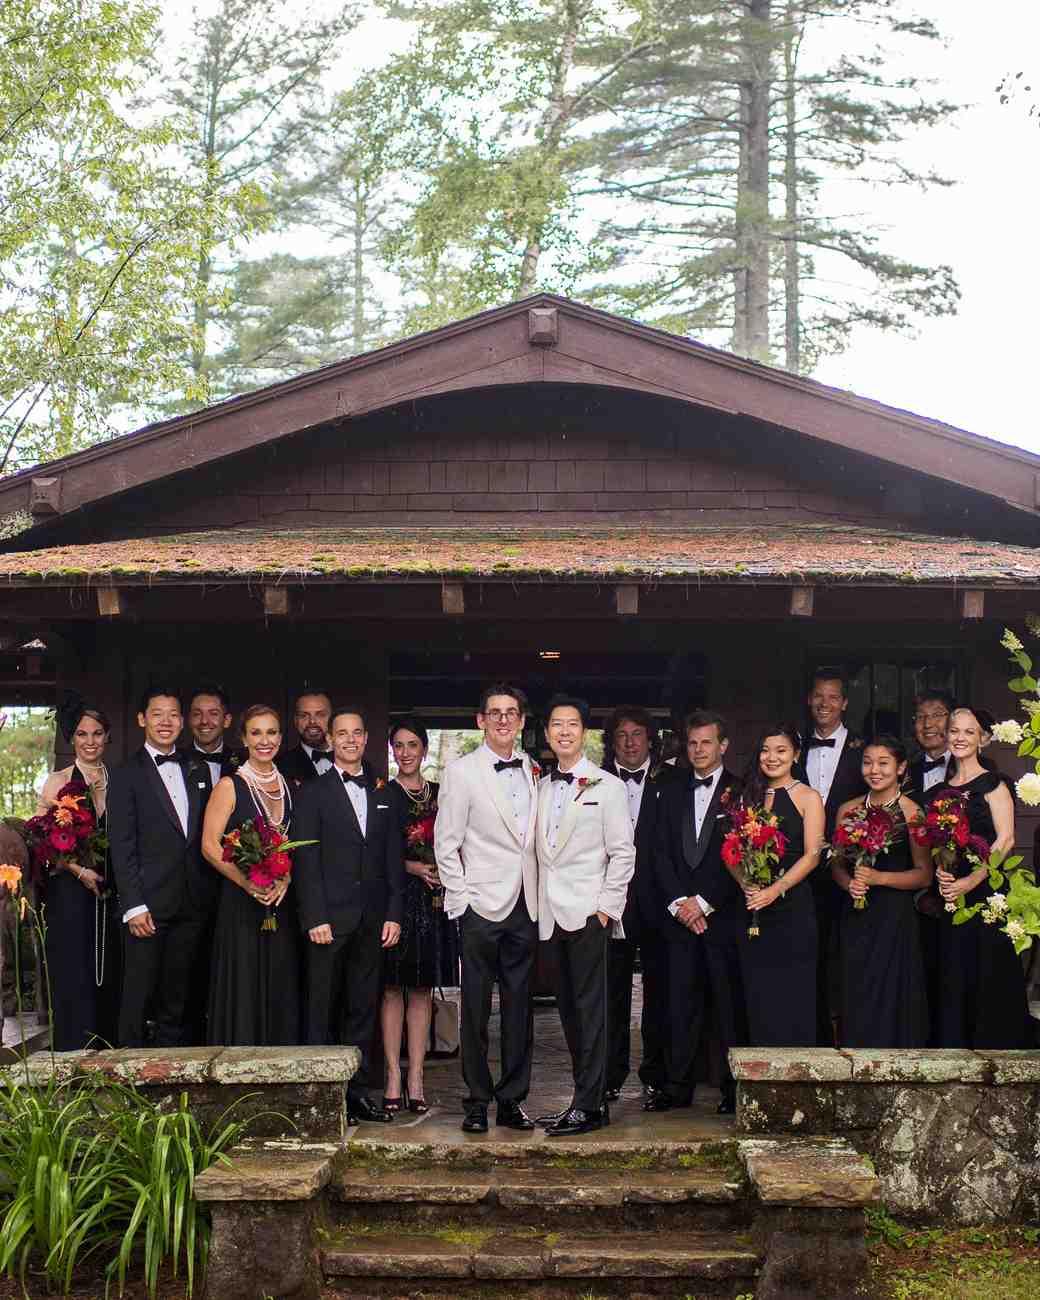 christopher-stephen-wedding-weddingparty-0200-s112787-0416.jpg